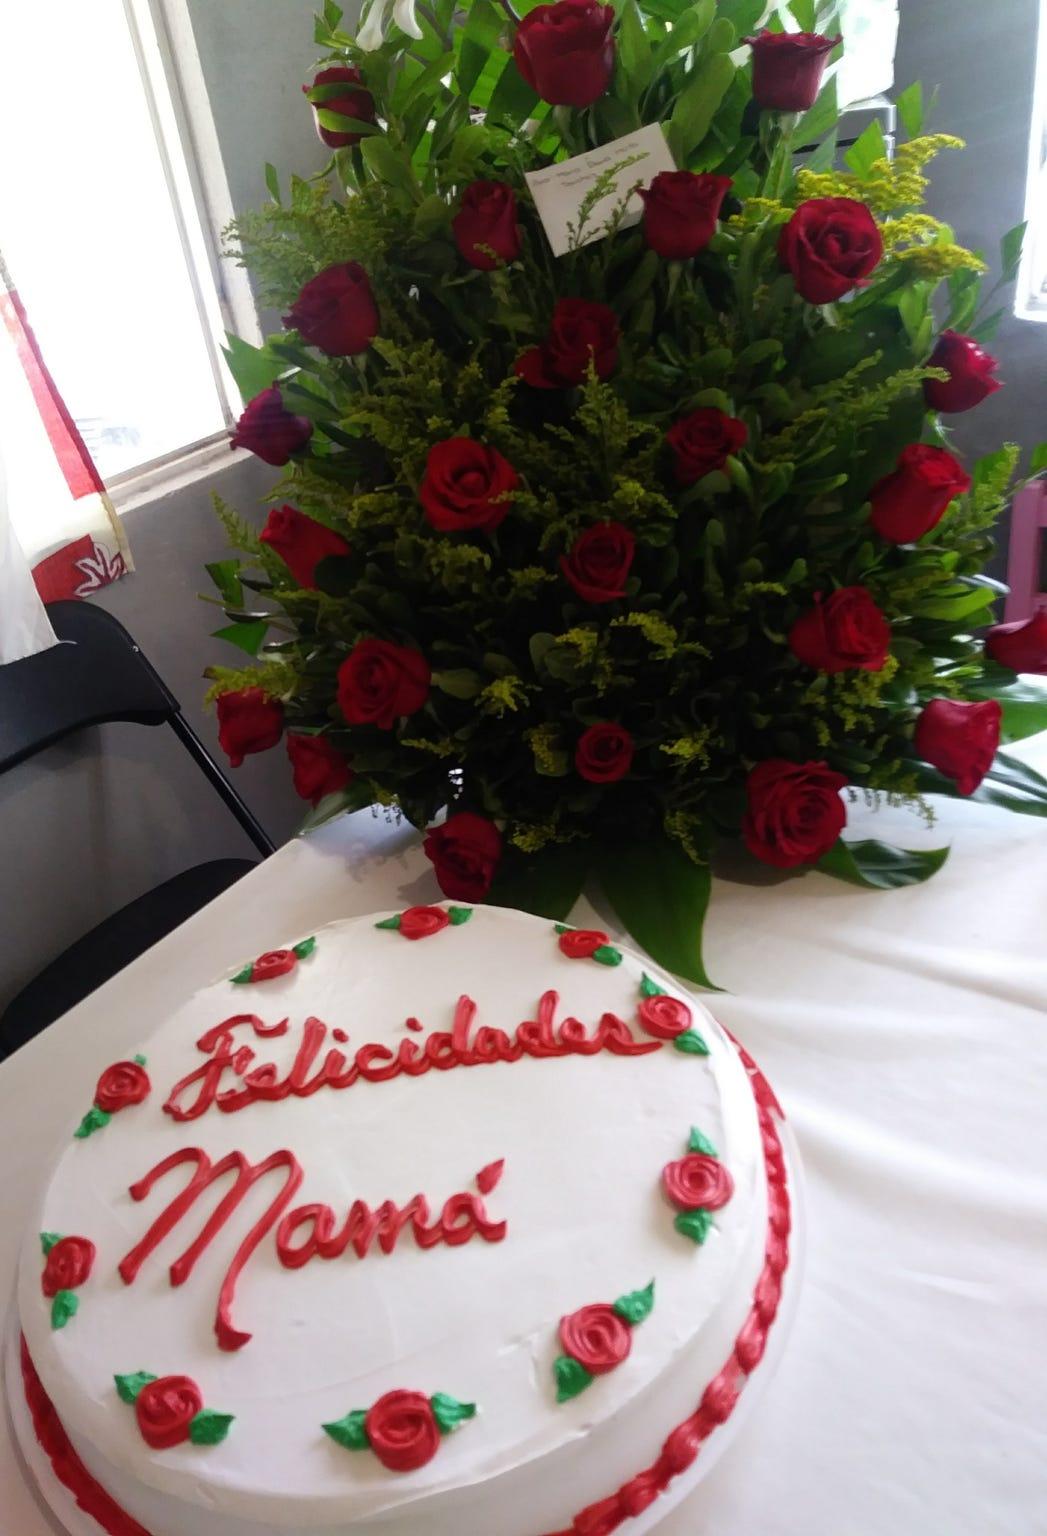 The birthday cake for María Elena Maya Sánchez.